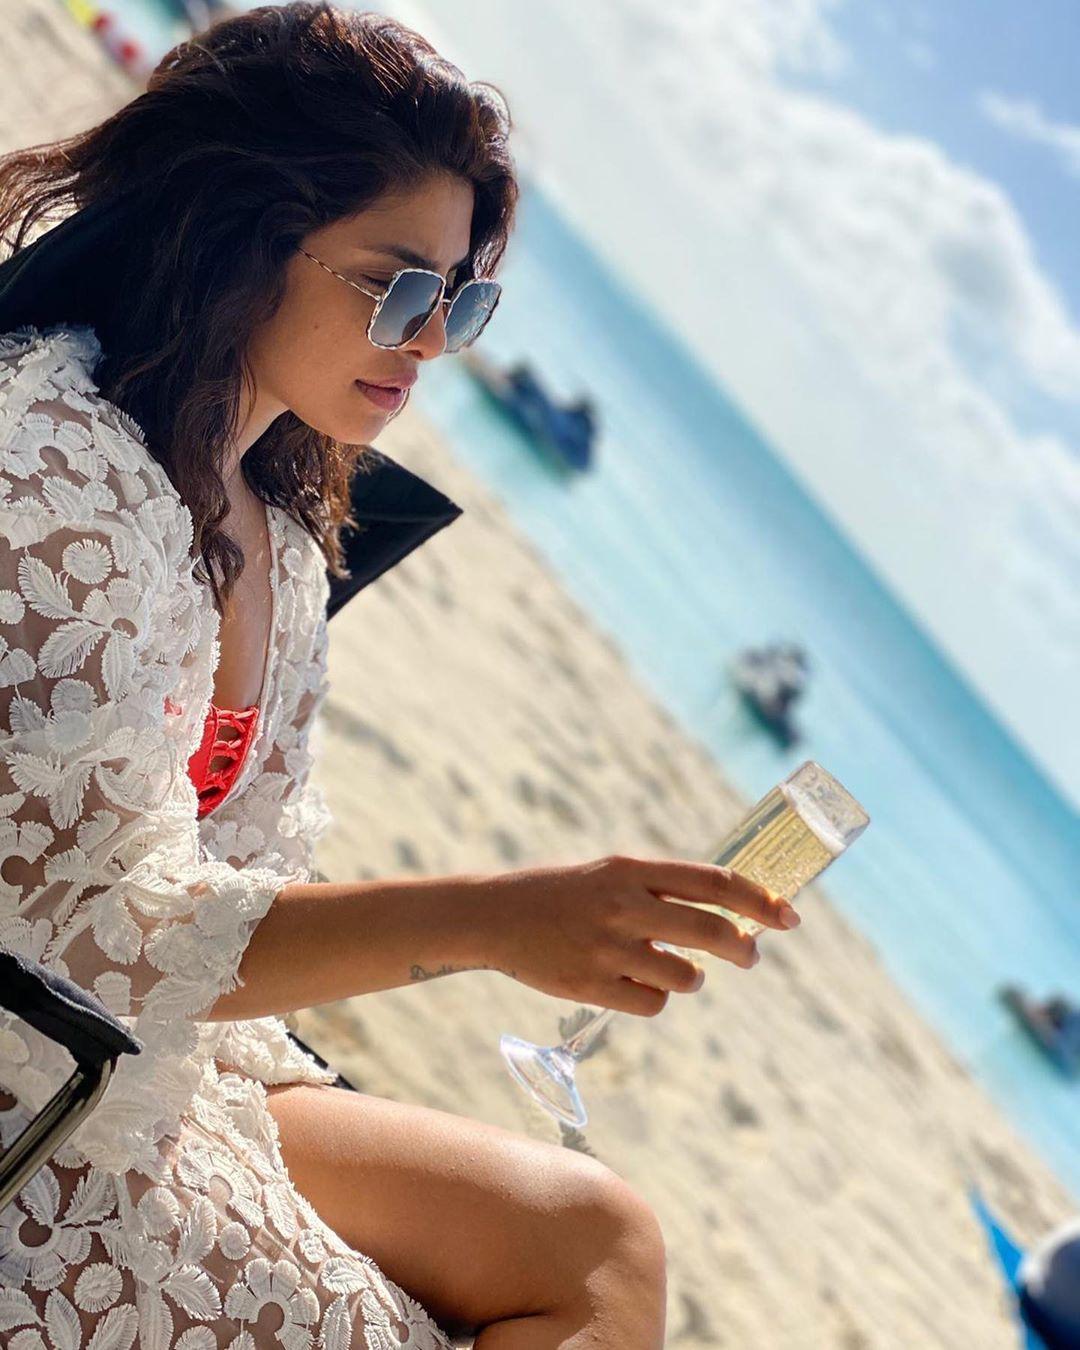 Priyanka Chopra 5 HD images